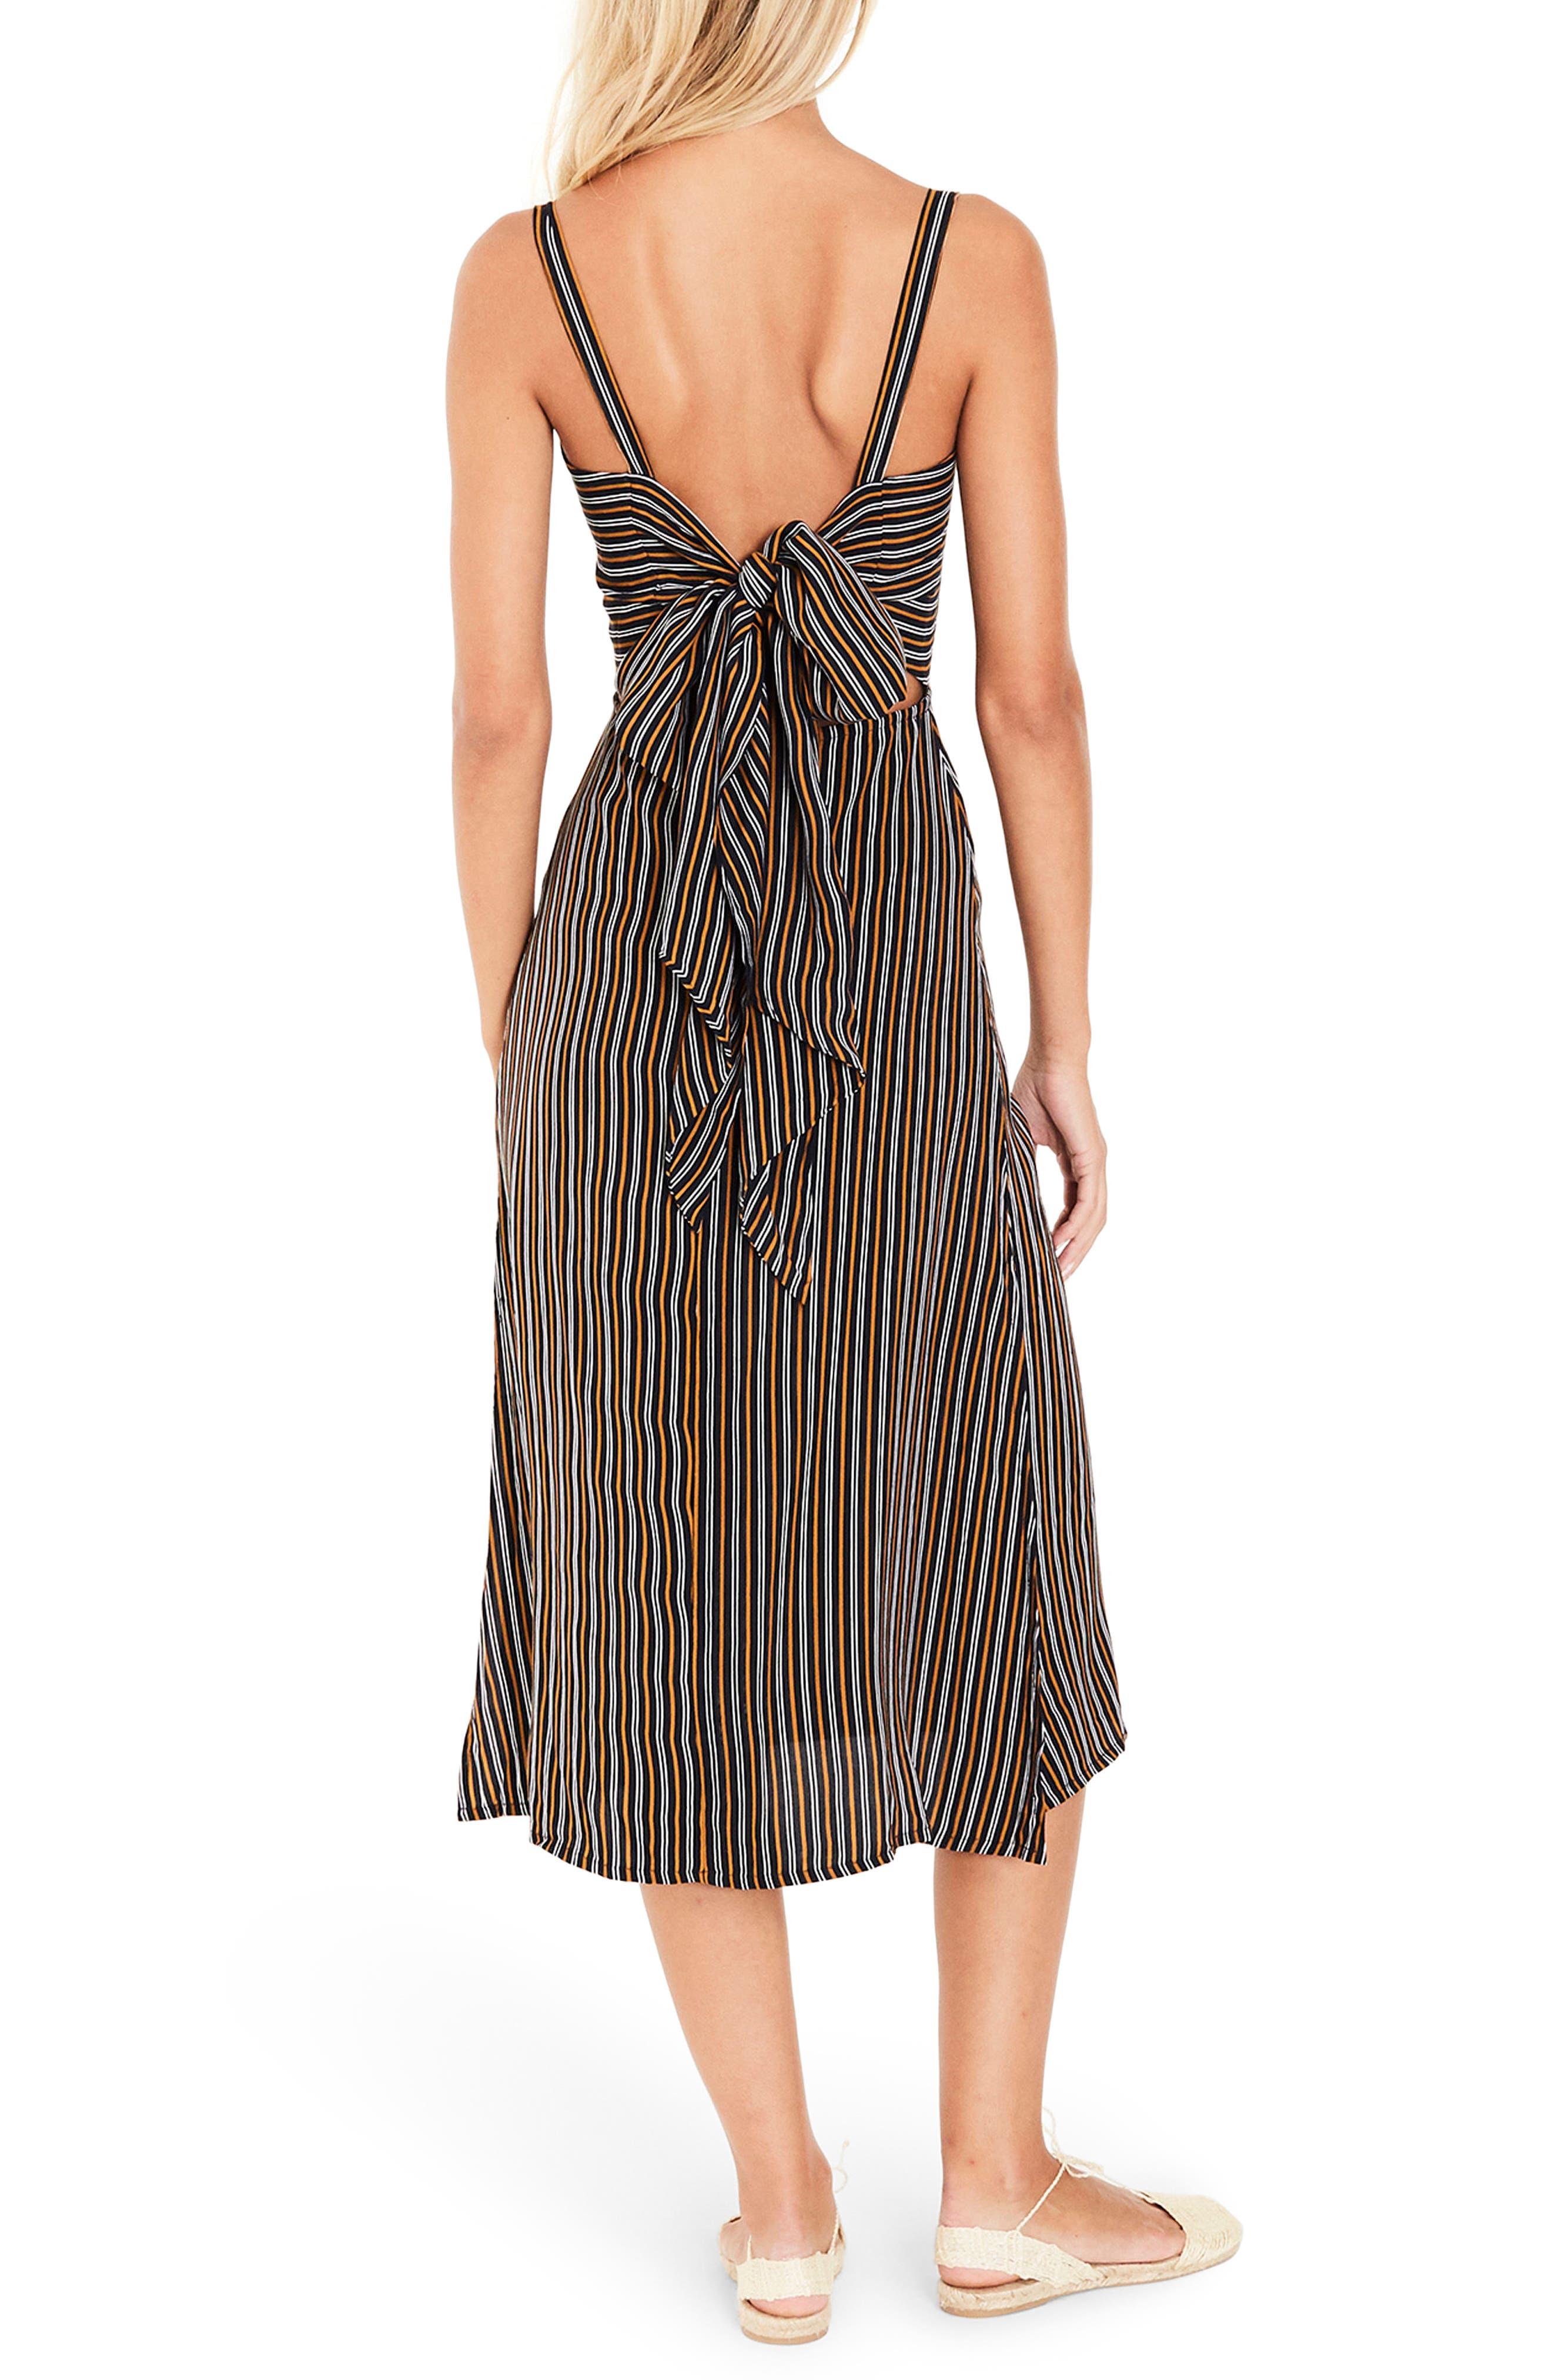 Katergo Stripe Tie Back Midi Dress,                             Alternate thumbnail 3, color,                             Glasgow Stripe Print